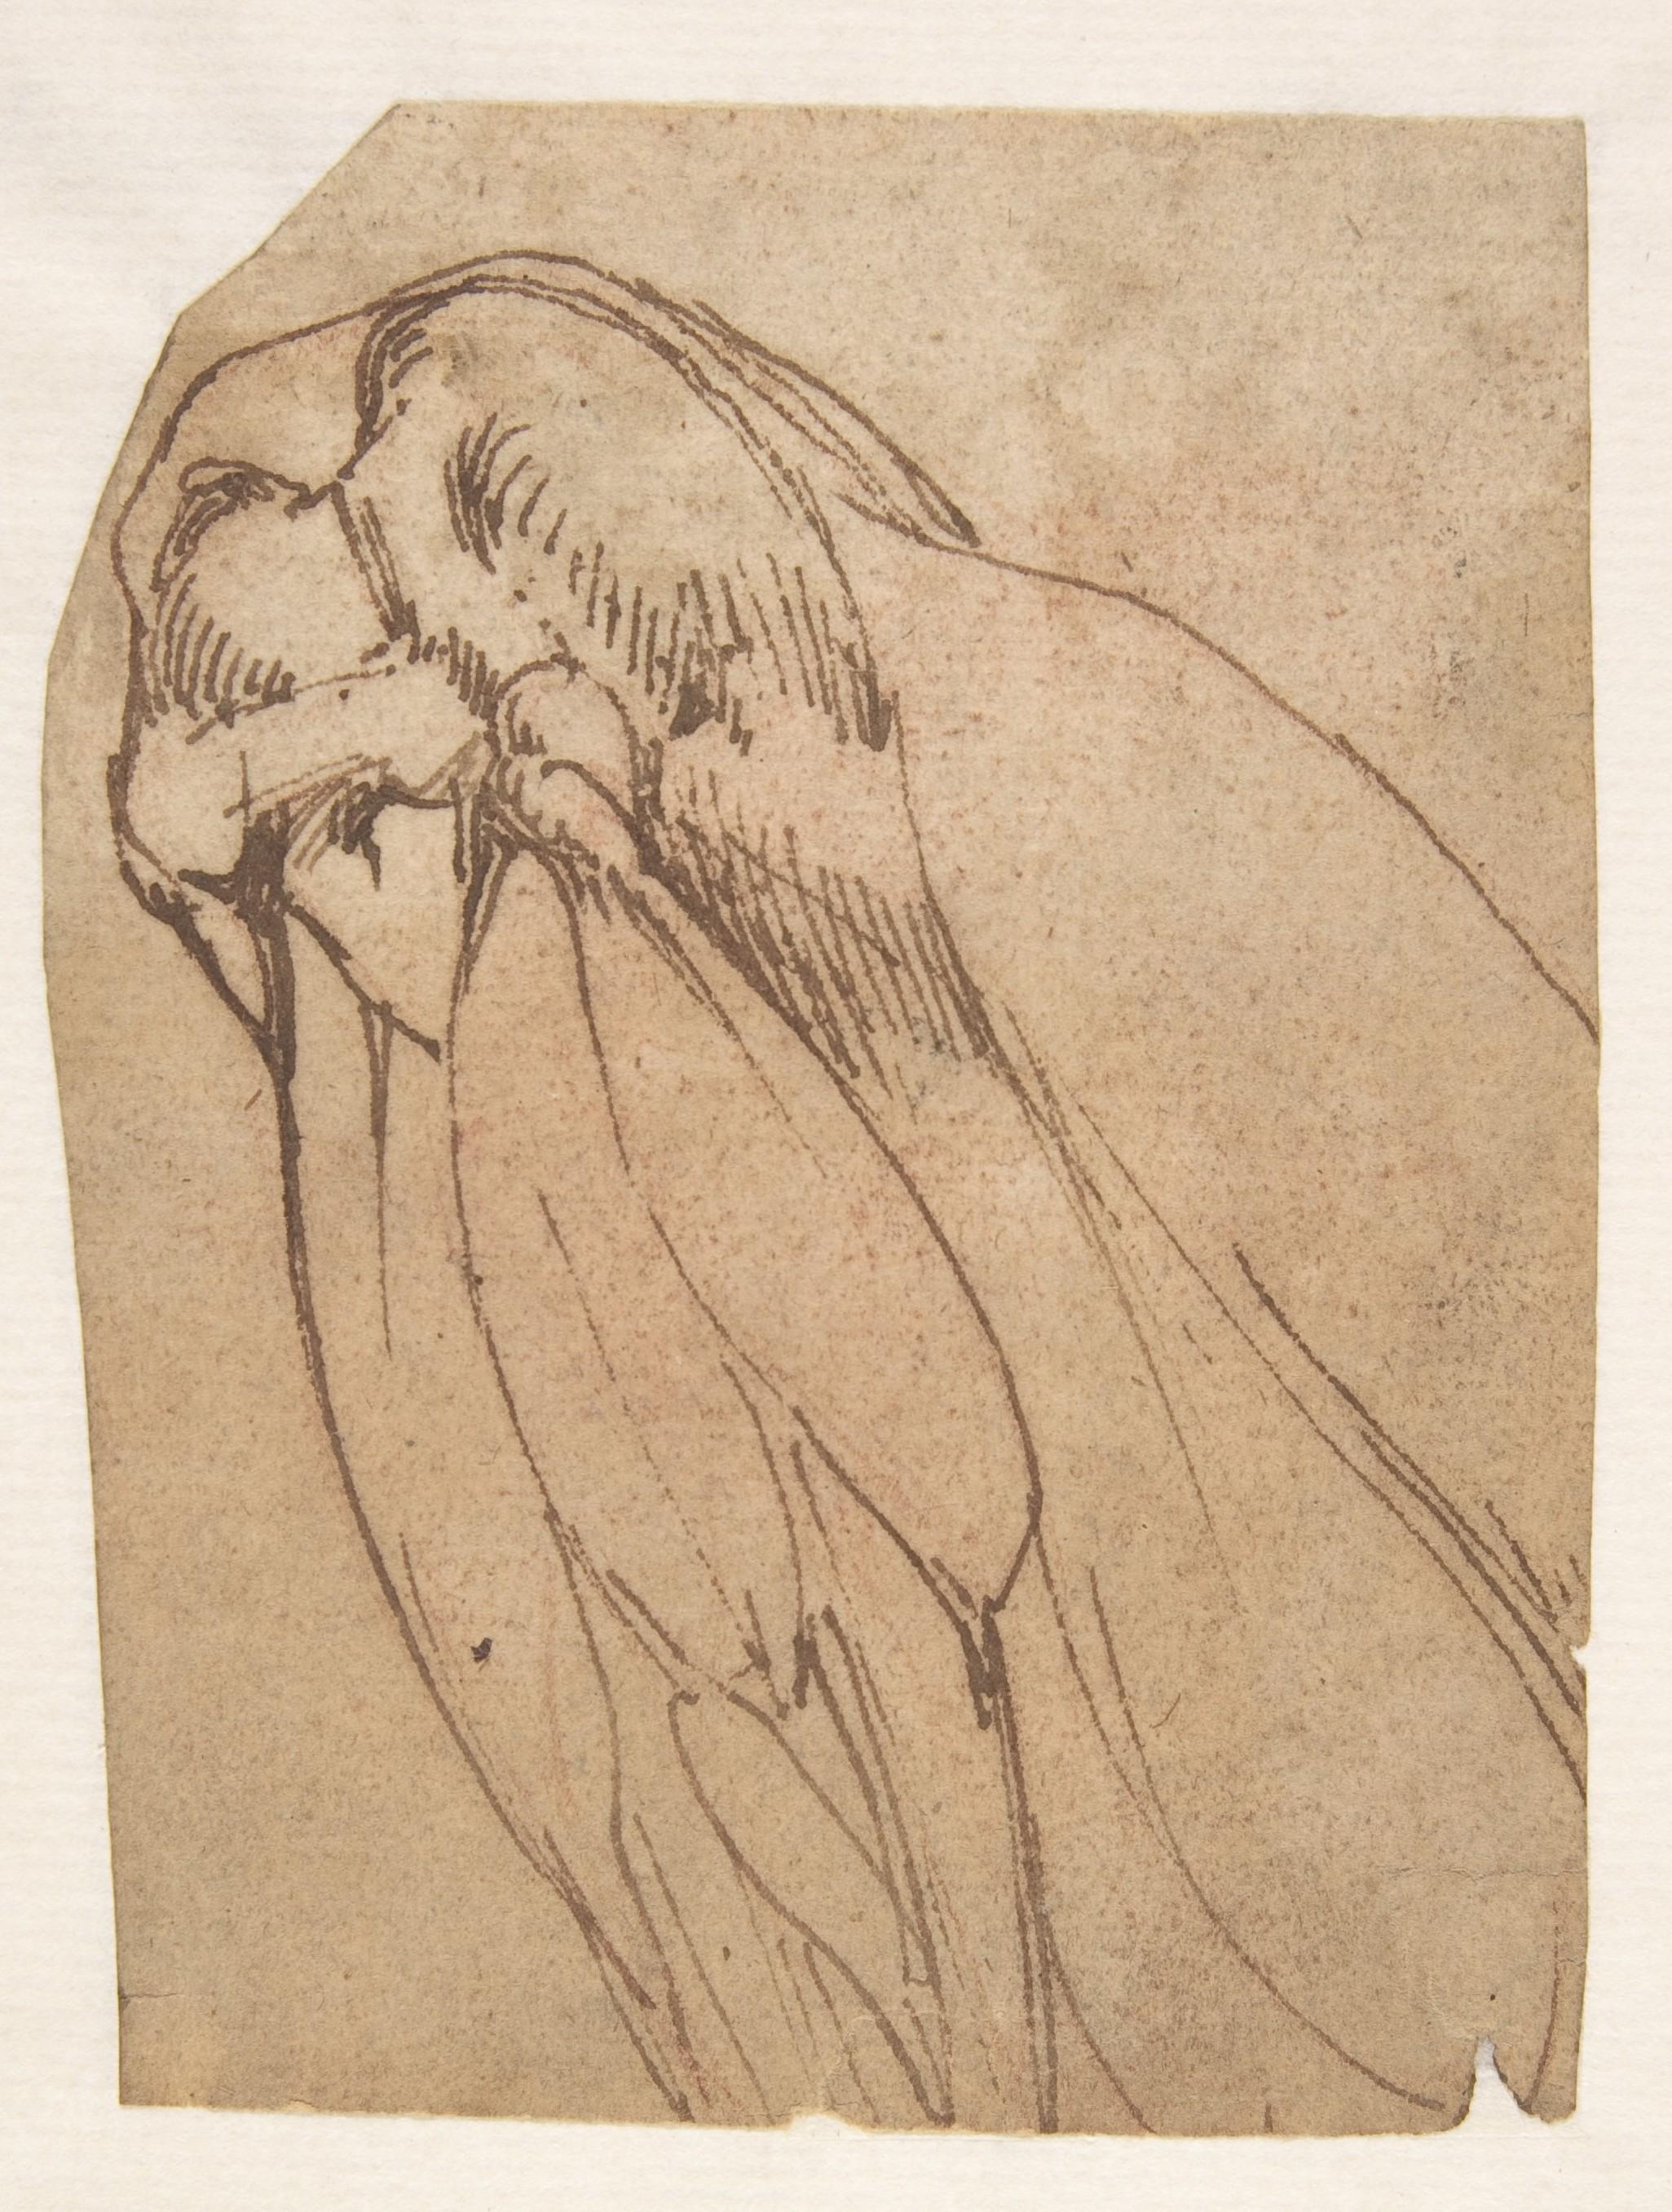 School of Michelangelo Buonarroti | Anatomical Study of a Knee | The Met